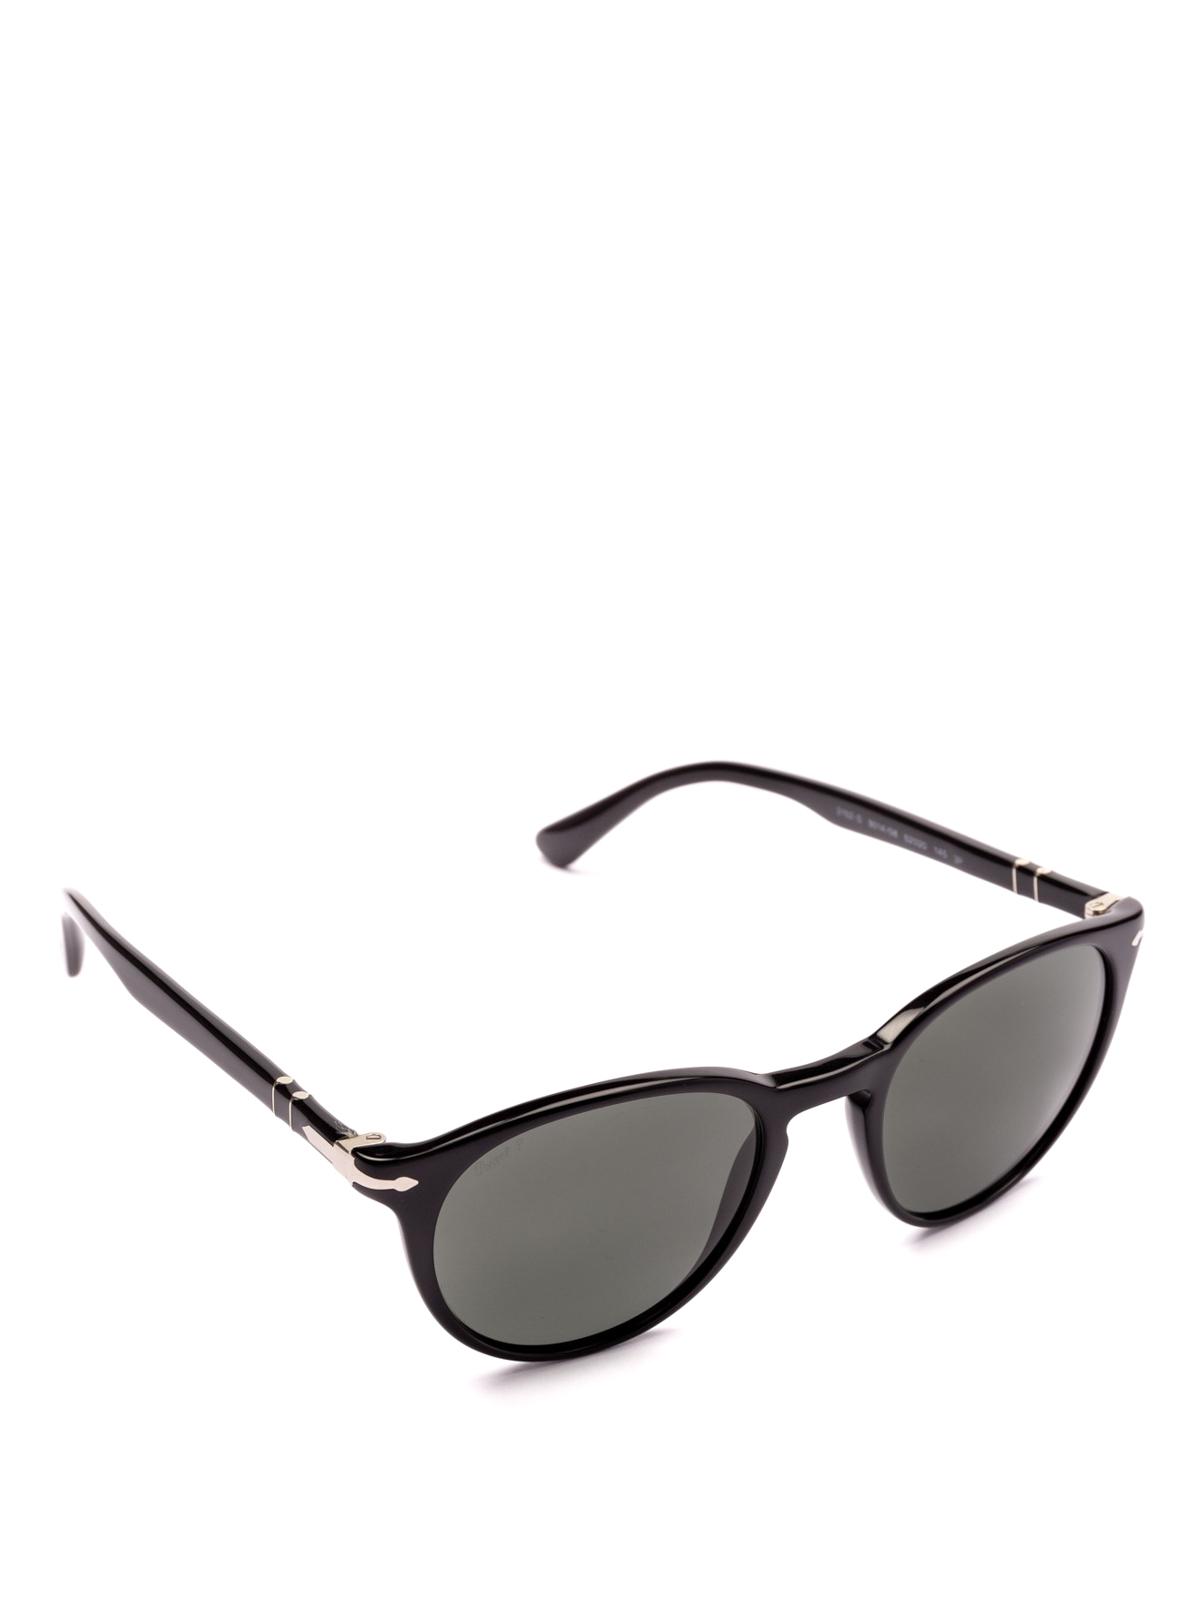 5d3a701e6b425 Persol - Black frame oval lens sunglasses - sunglasses - 3152S 9014 58